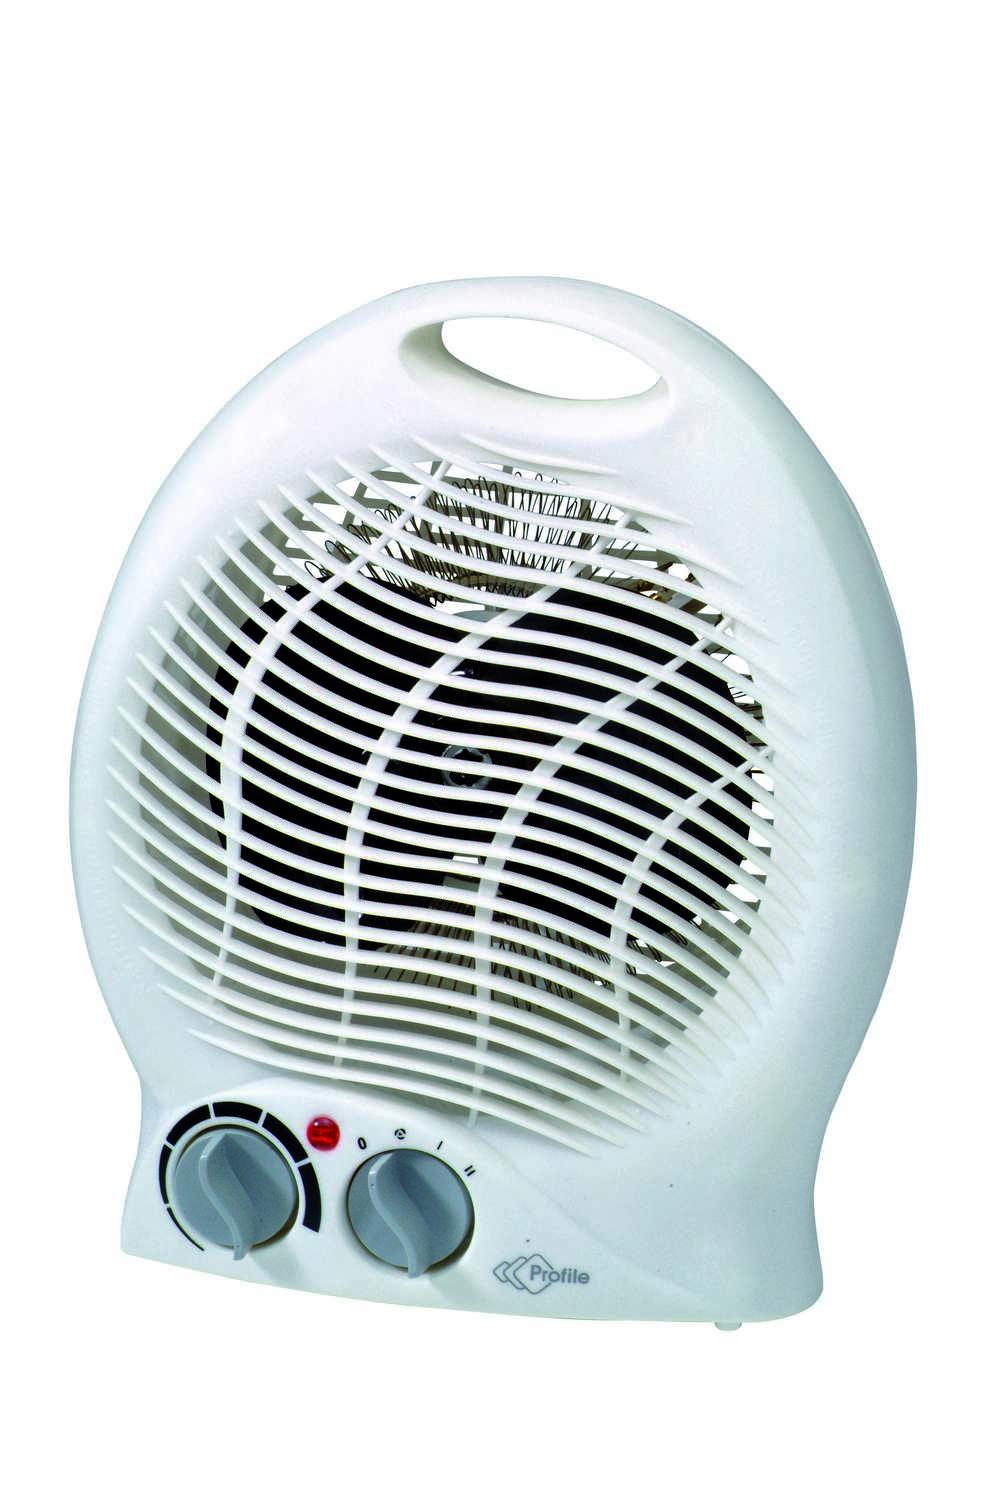 Kachel Ventilator Moesson 3pos 2000